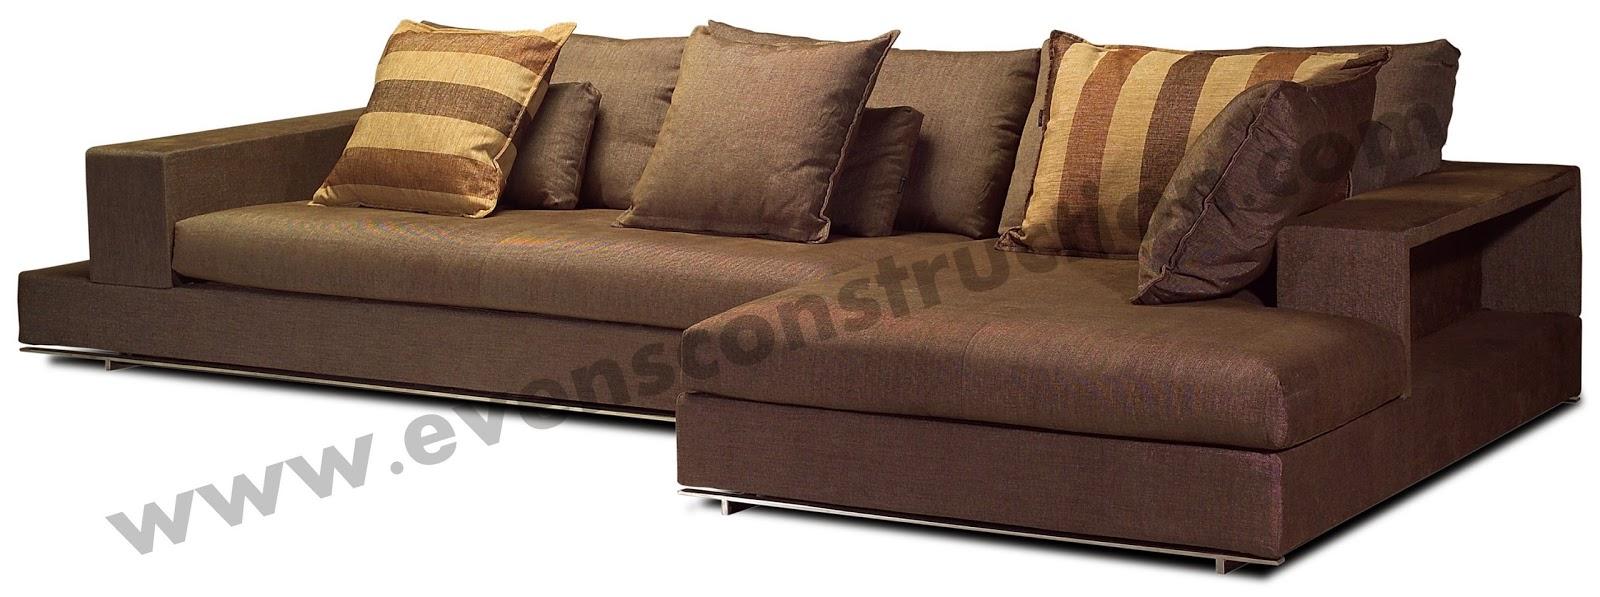 Best Designer Sleeper Sofas - Sofa Design